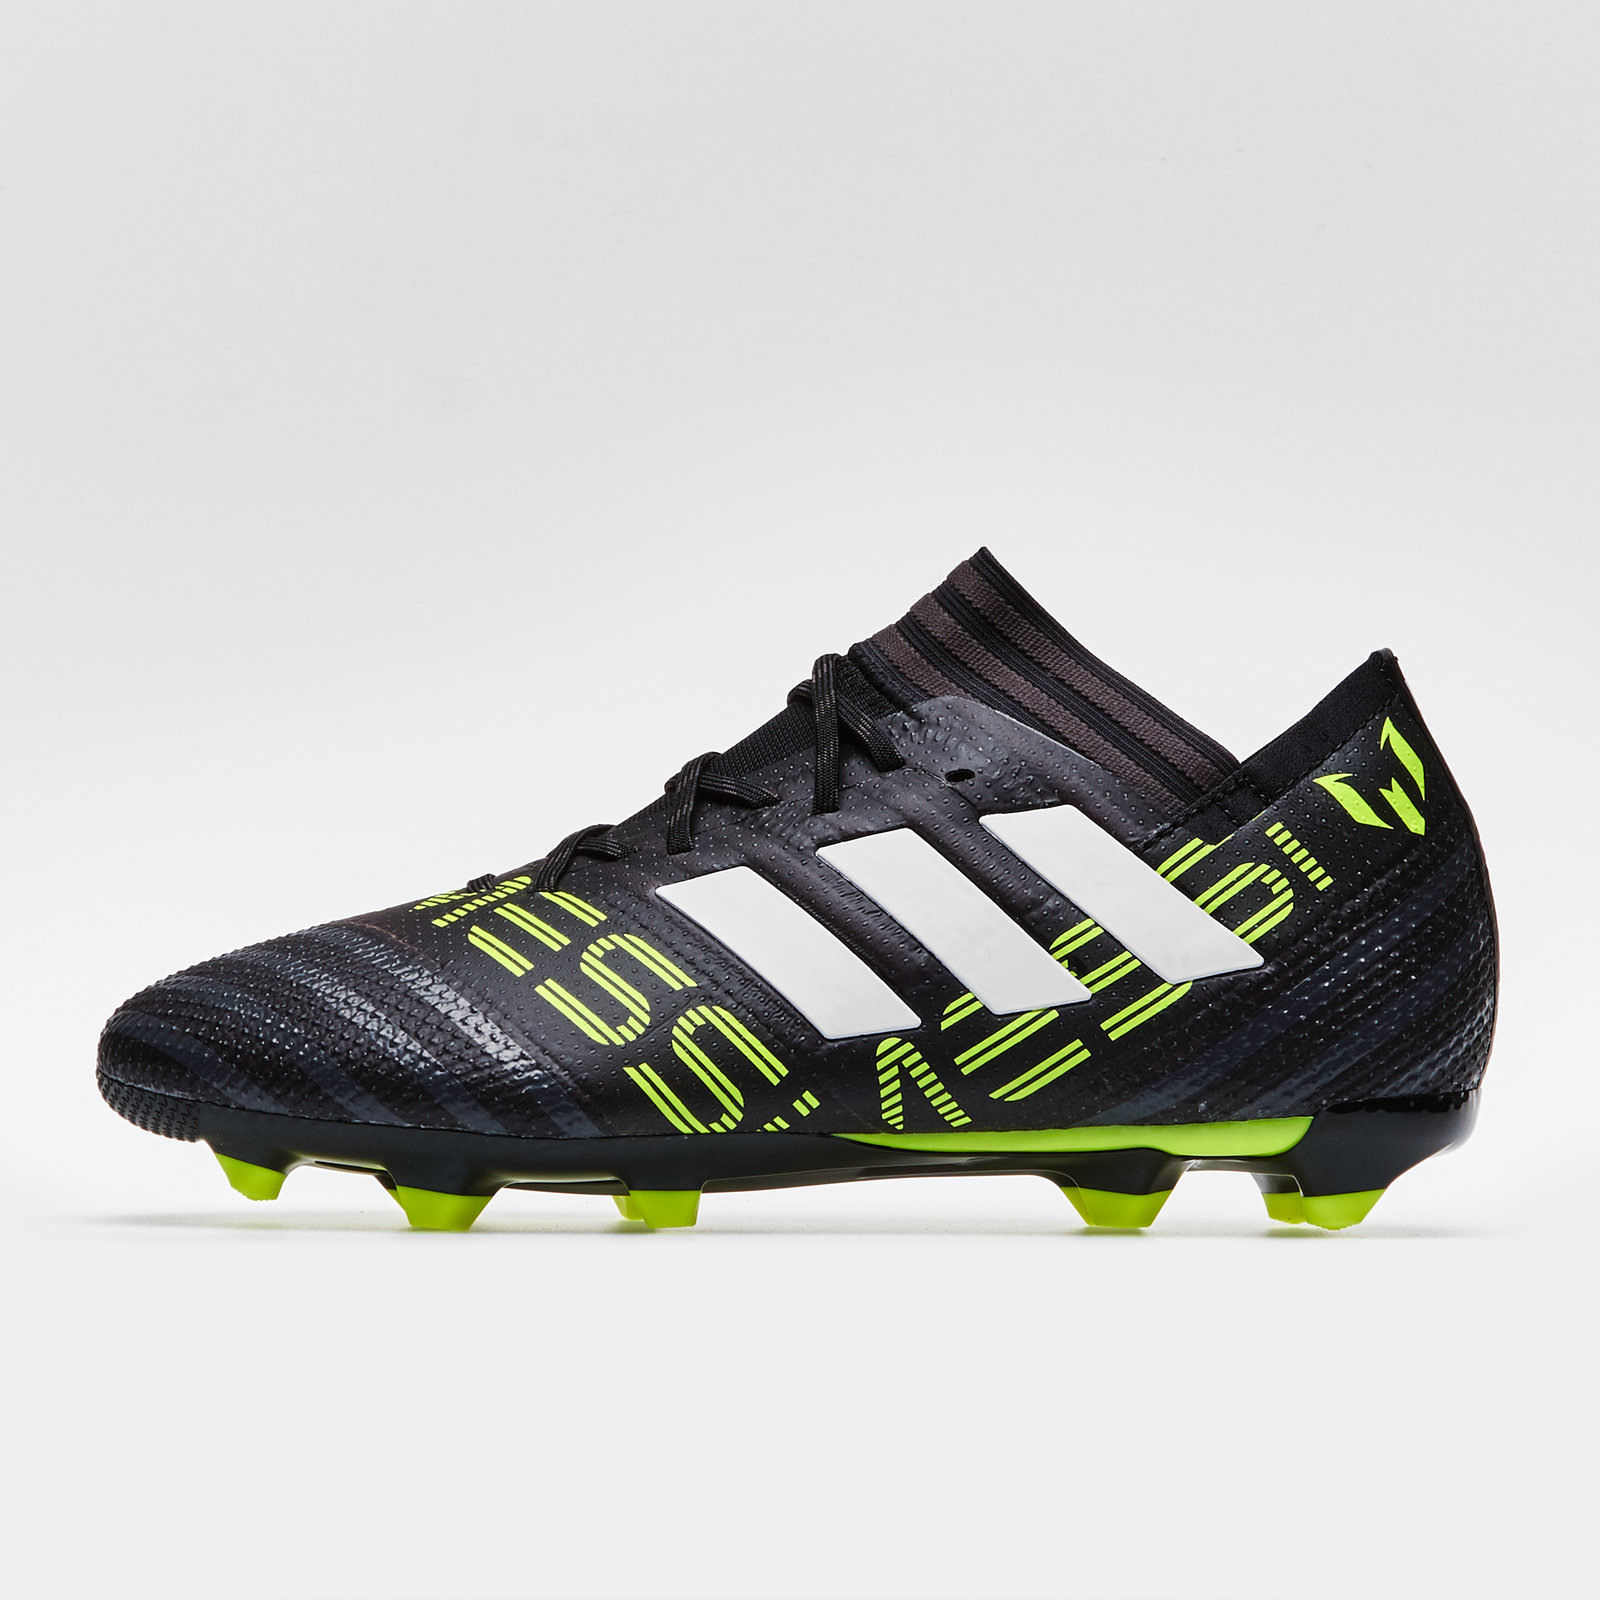 90877c853 adidas unisex Nemeziz Messi 17.1 FG Kids Football Boots Shoes ...